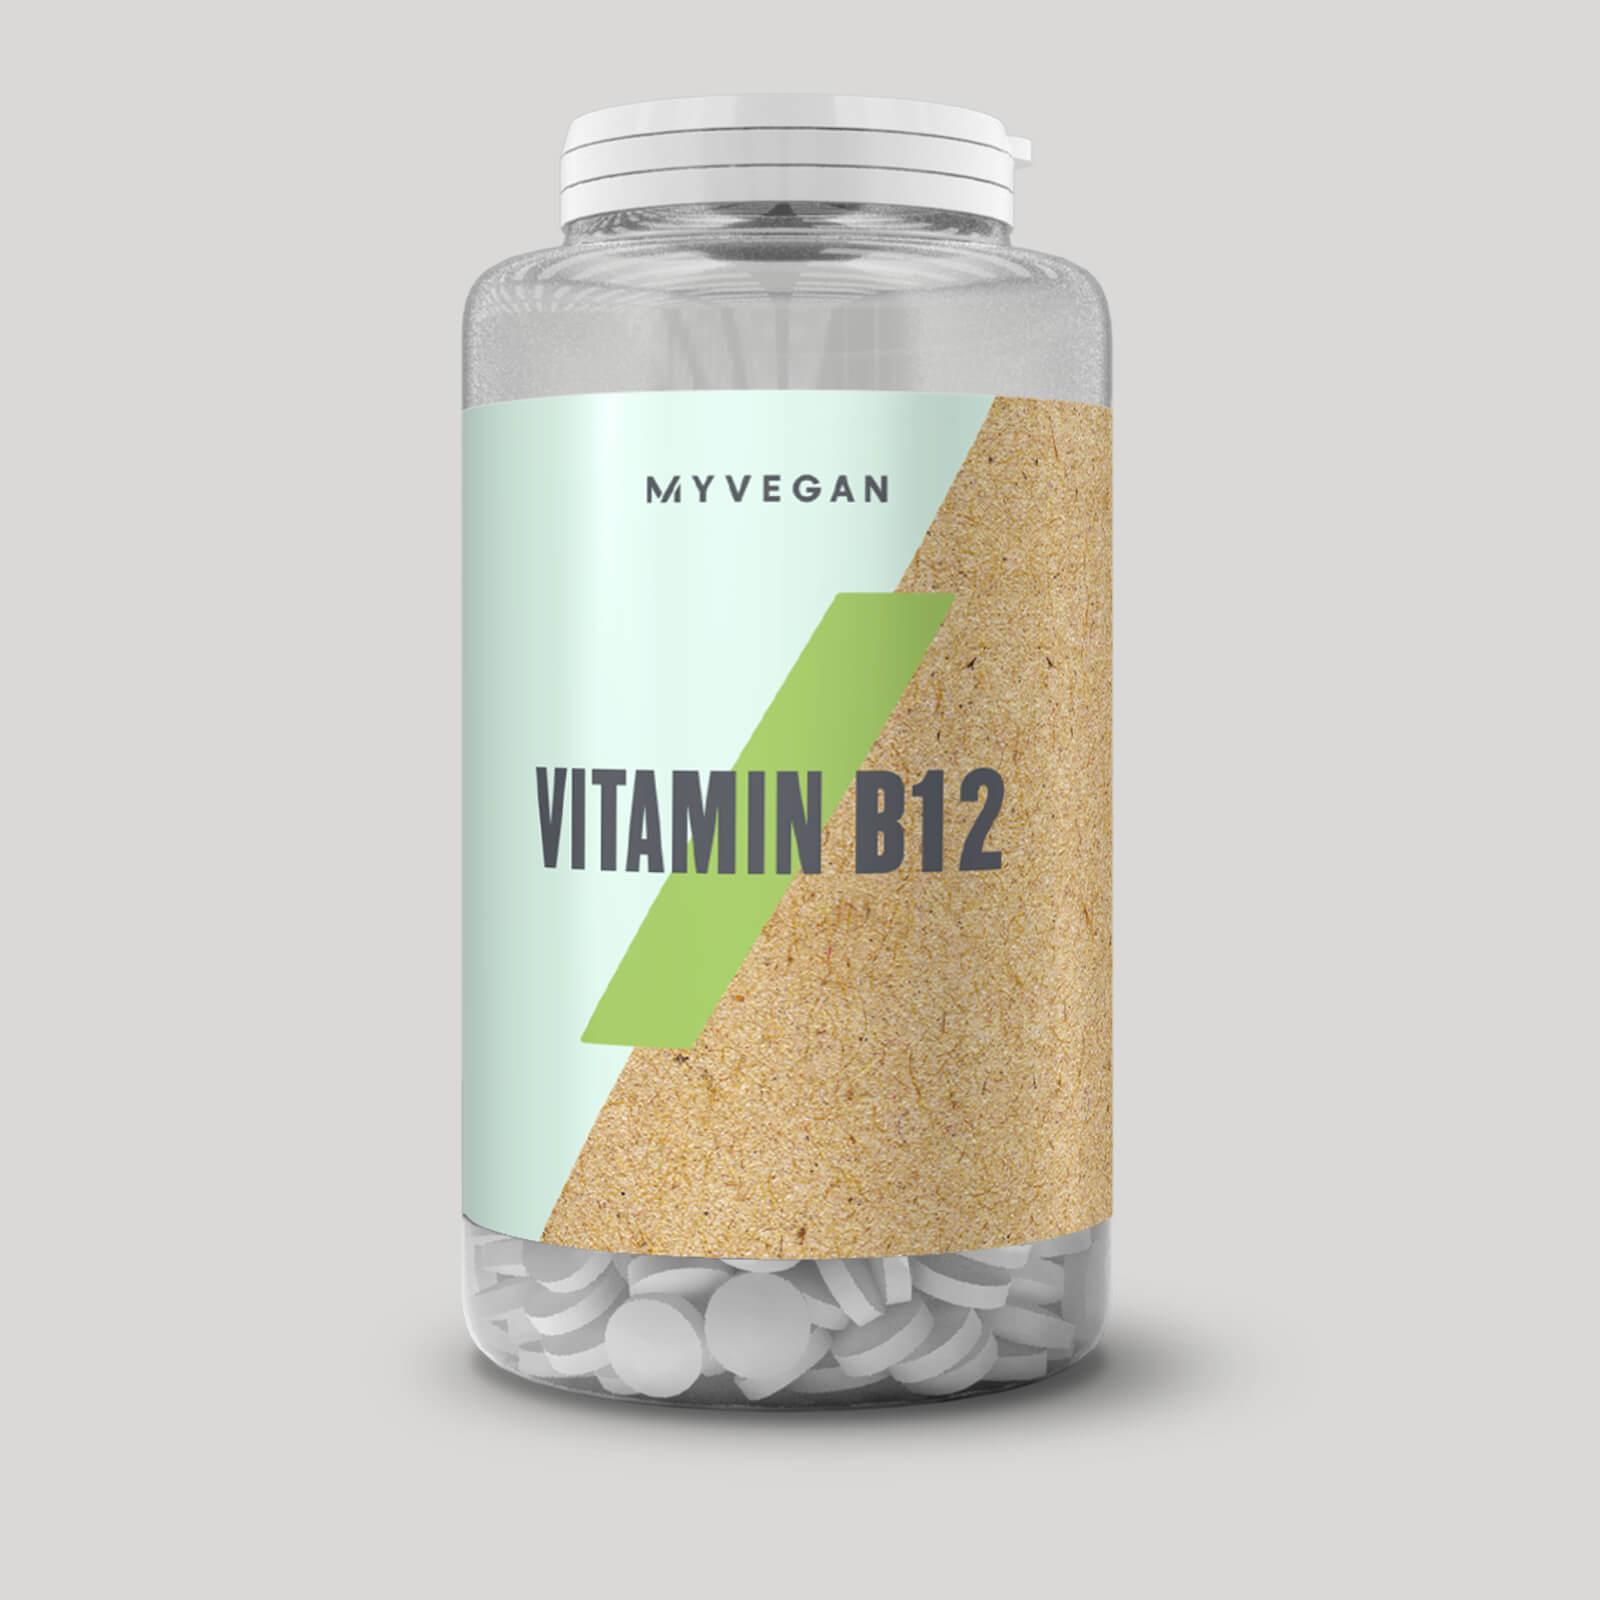 Myprotein Vegan Vitamin B12 - 60Tablets